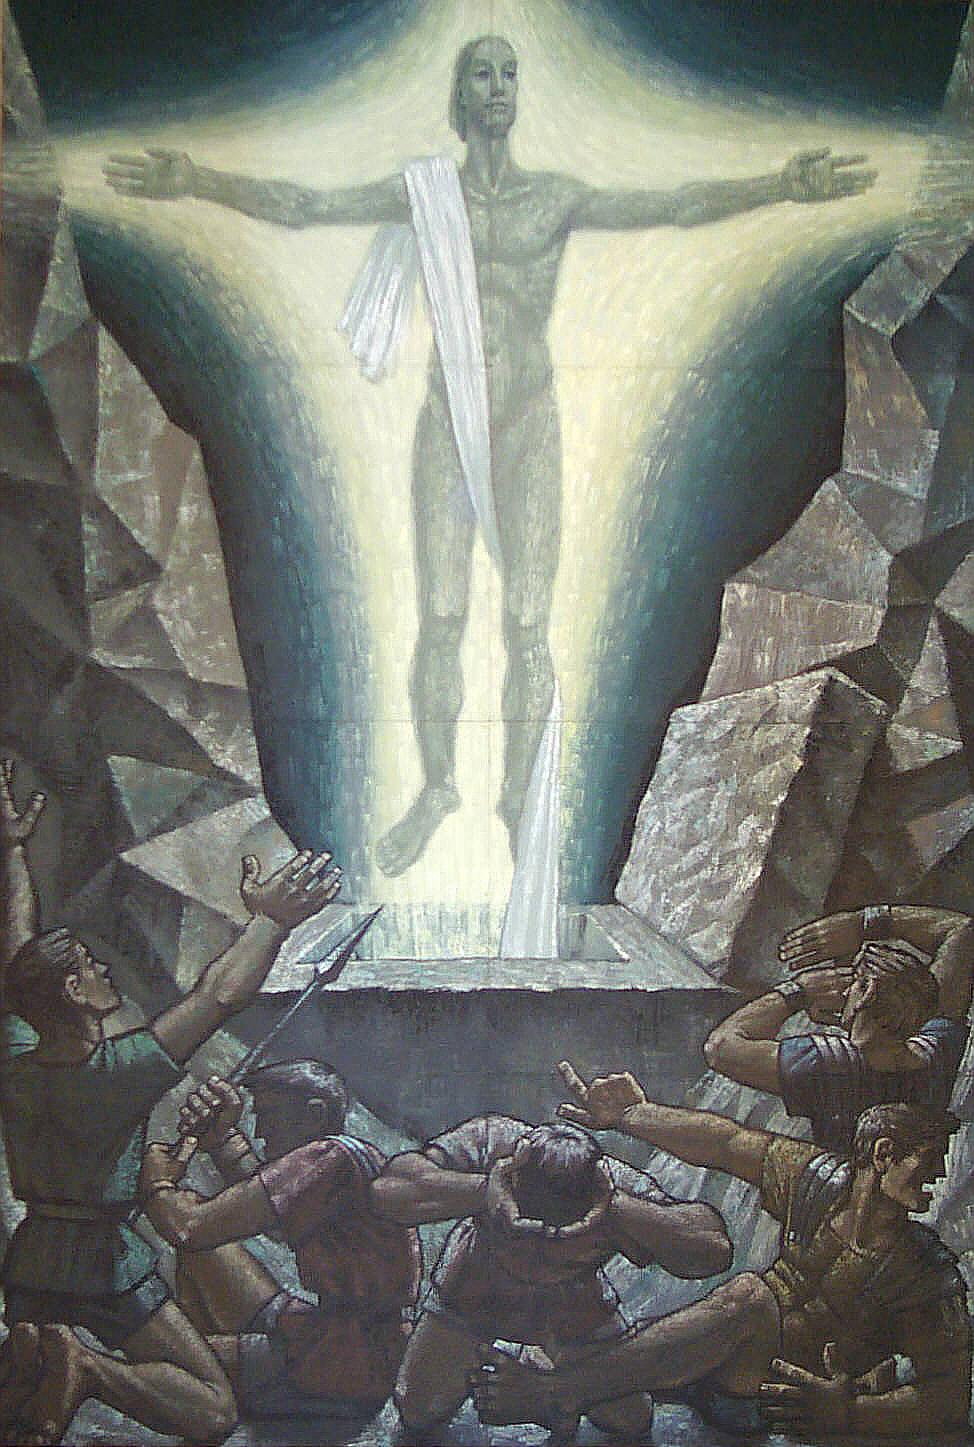 Cristianismo verdadero un blog singular 04 09 10 for Ta 2s 0138